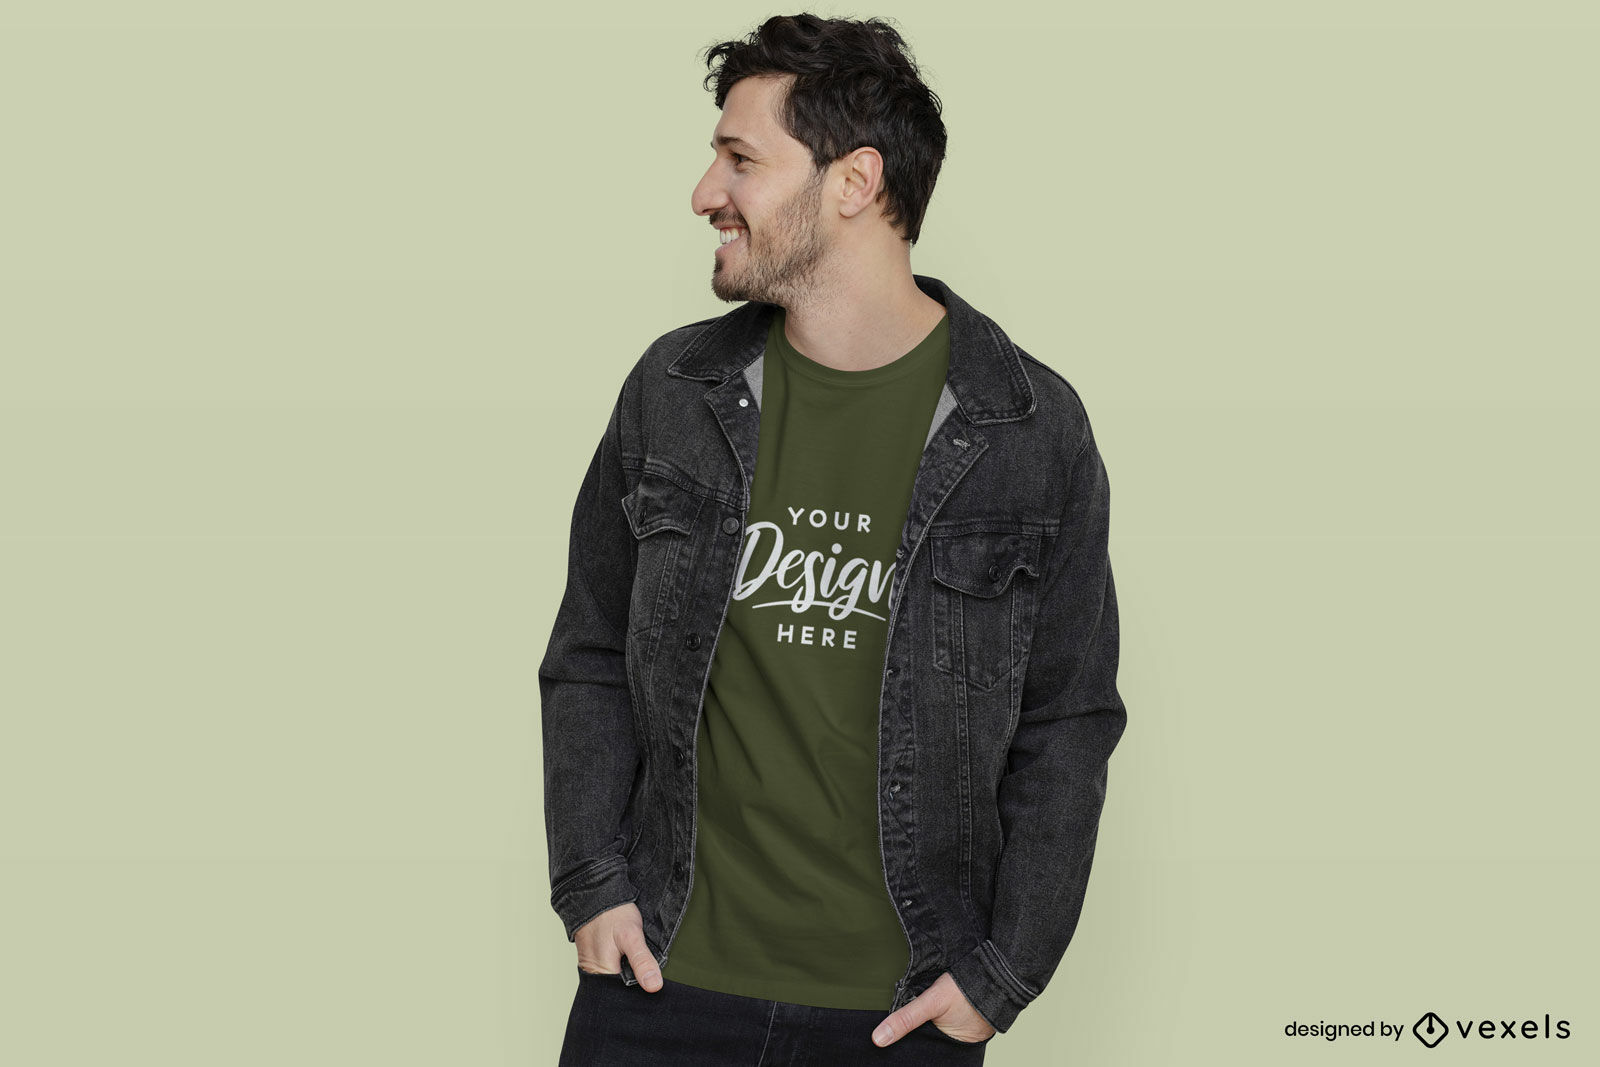 Hombre en maqueta de camiseta verde con chaqueta